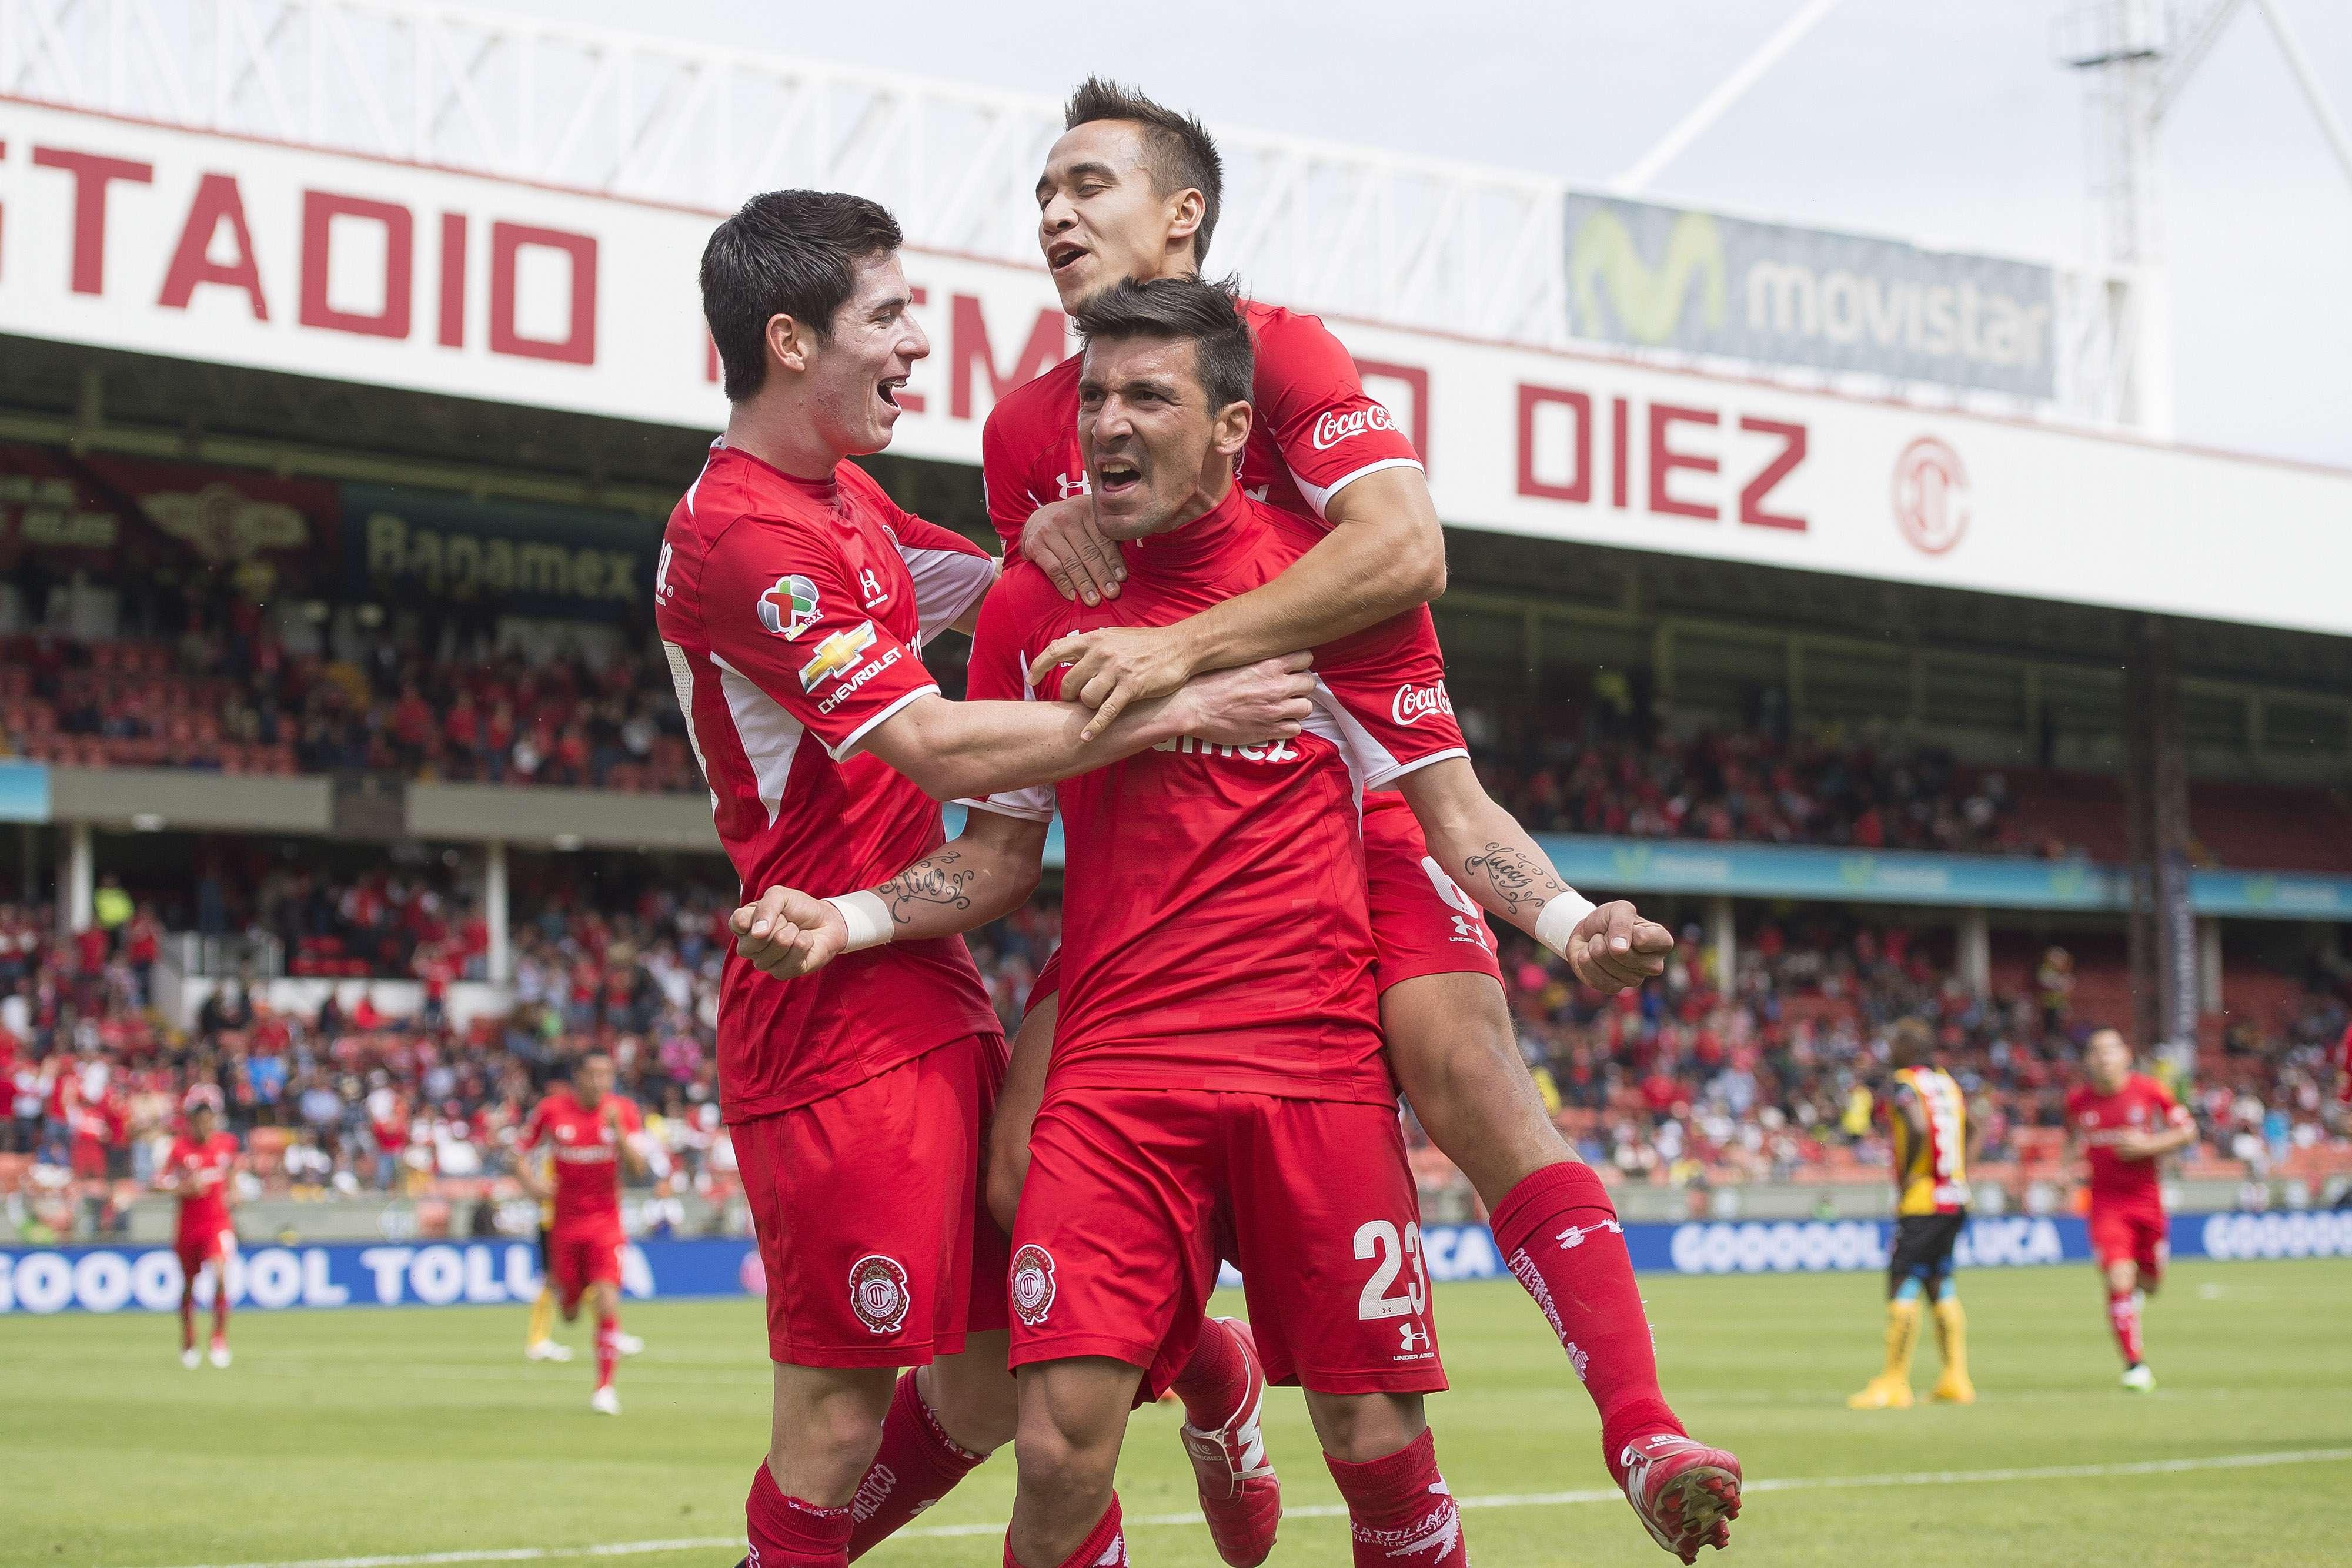 Édgar Benítez marcó dos goles y Gerardo Rodríguez se apuntó un tanto, en la victoria de Toluca 3-1 sobre Leones Negros. Foto: Mexsport